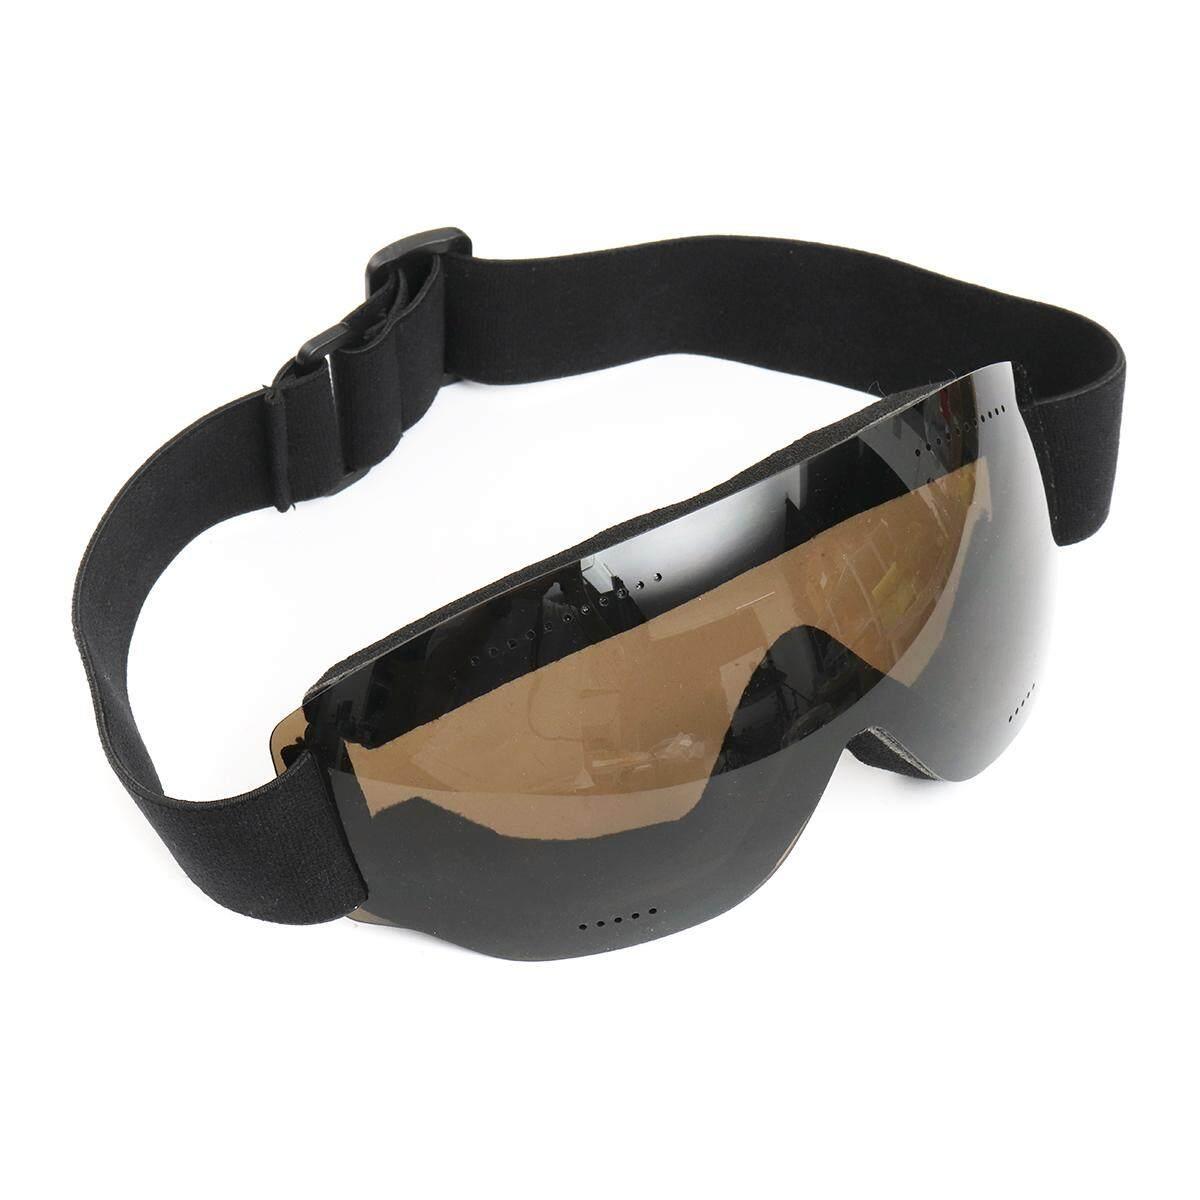 Frameless Anti-fog UV Protection Ski Glasses Skiing Goggles Snowboard Unisex Brown